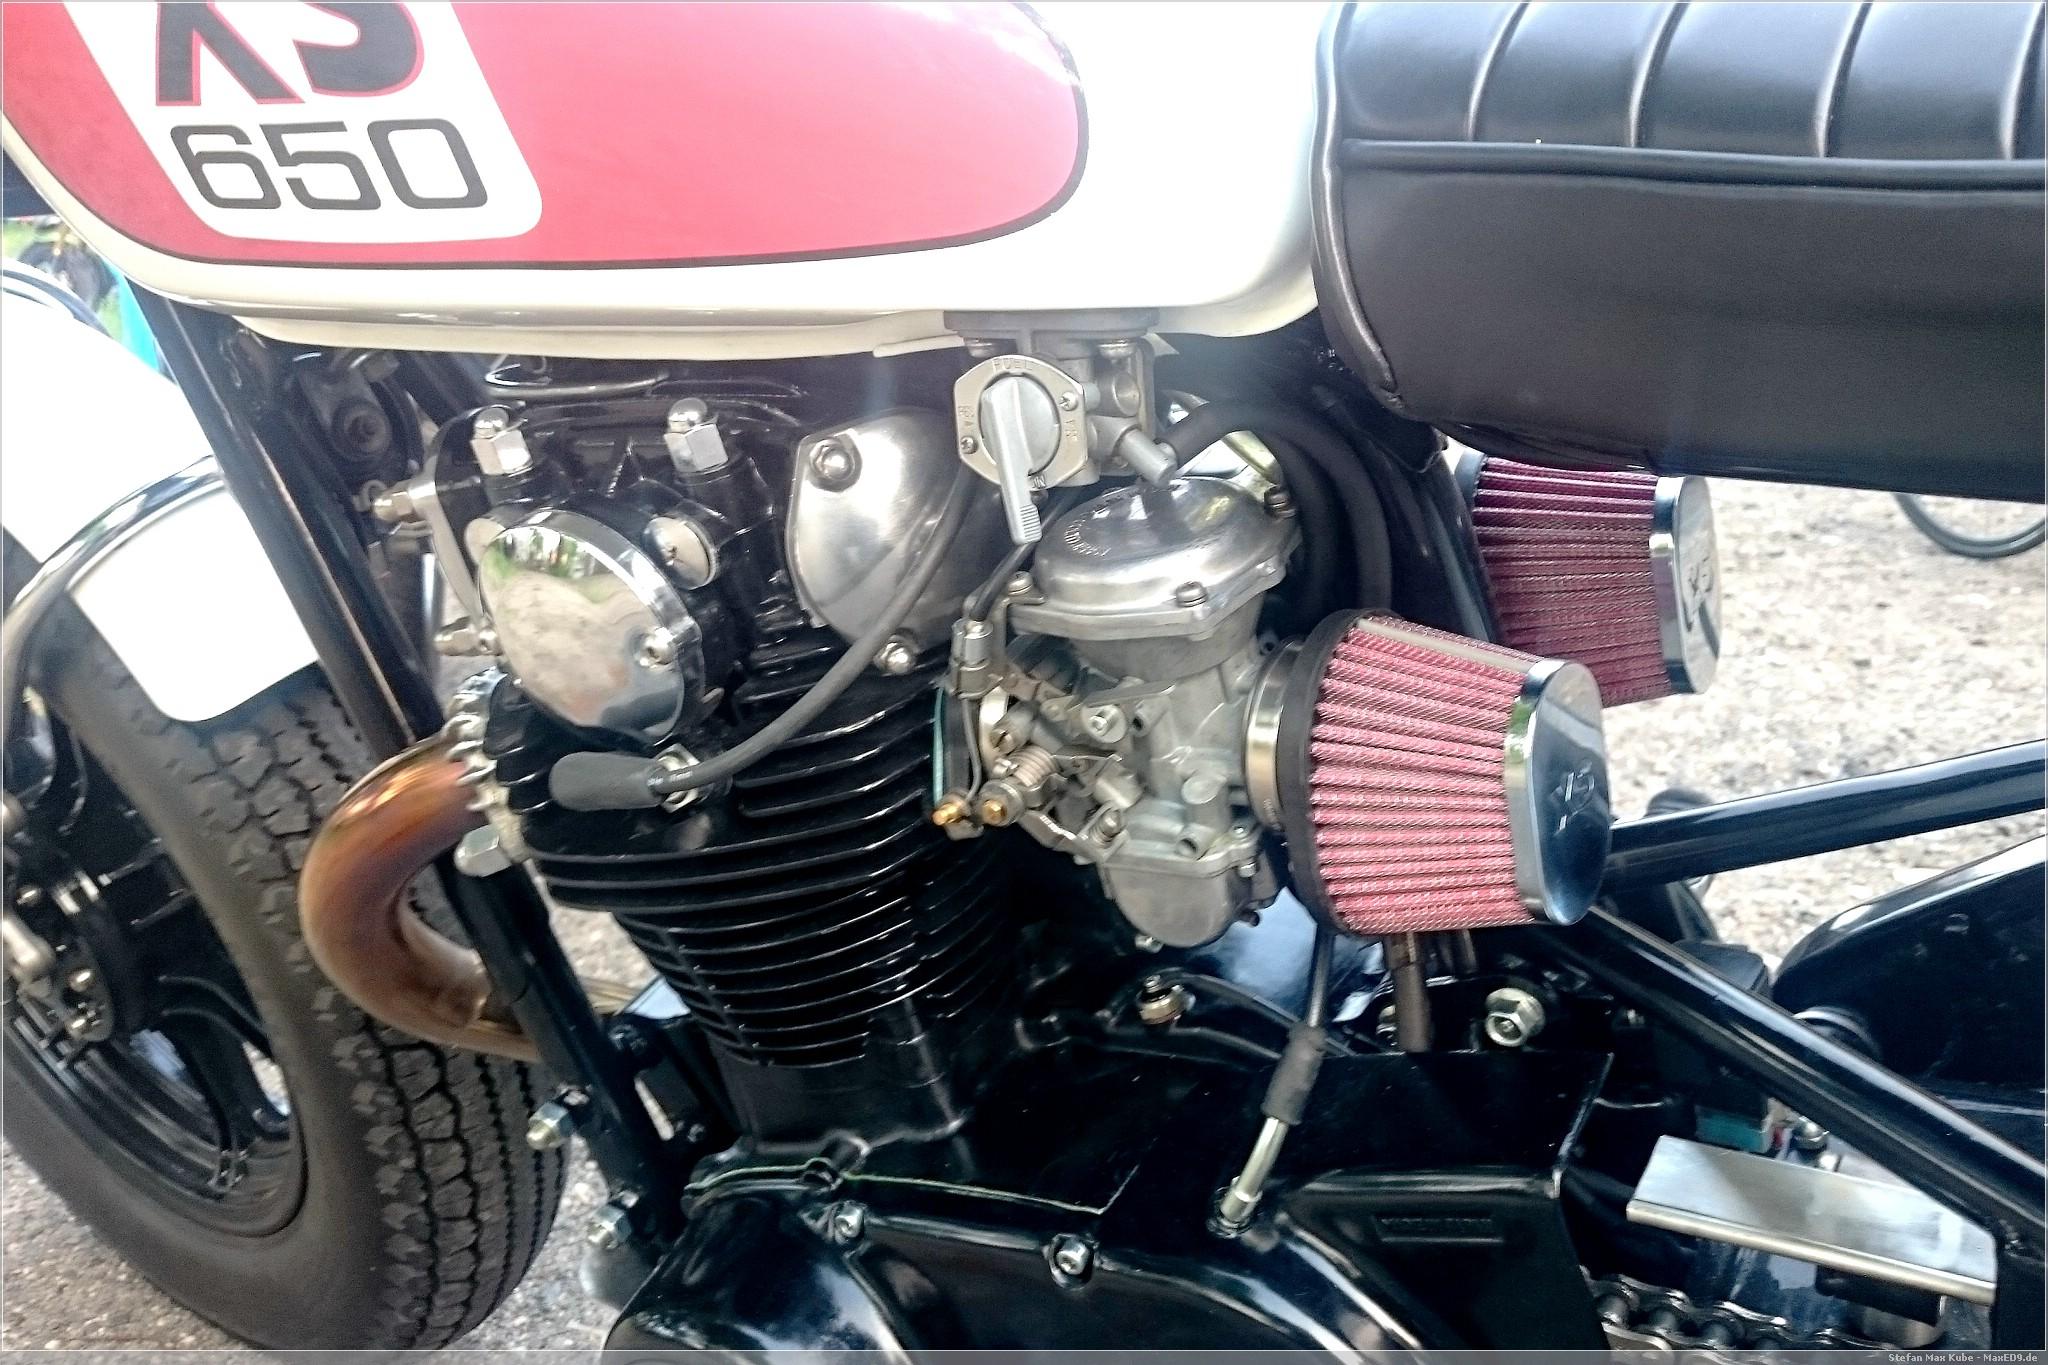 Yamaha XS 650 @ Urban Motor